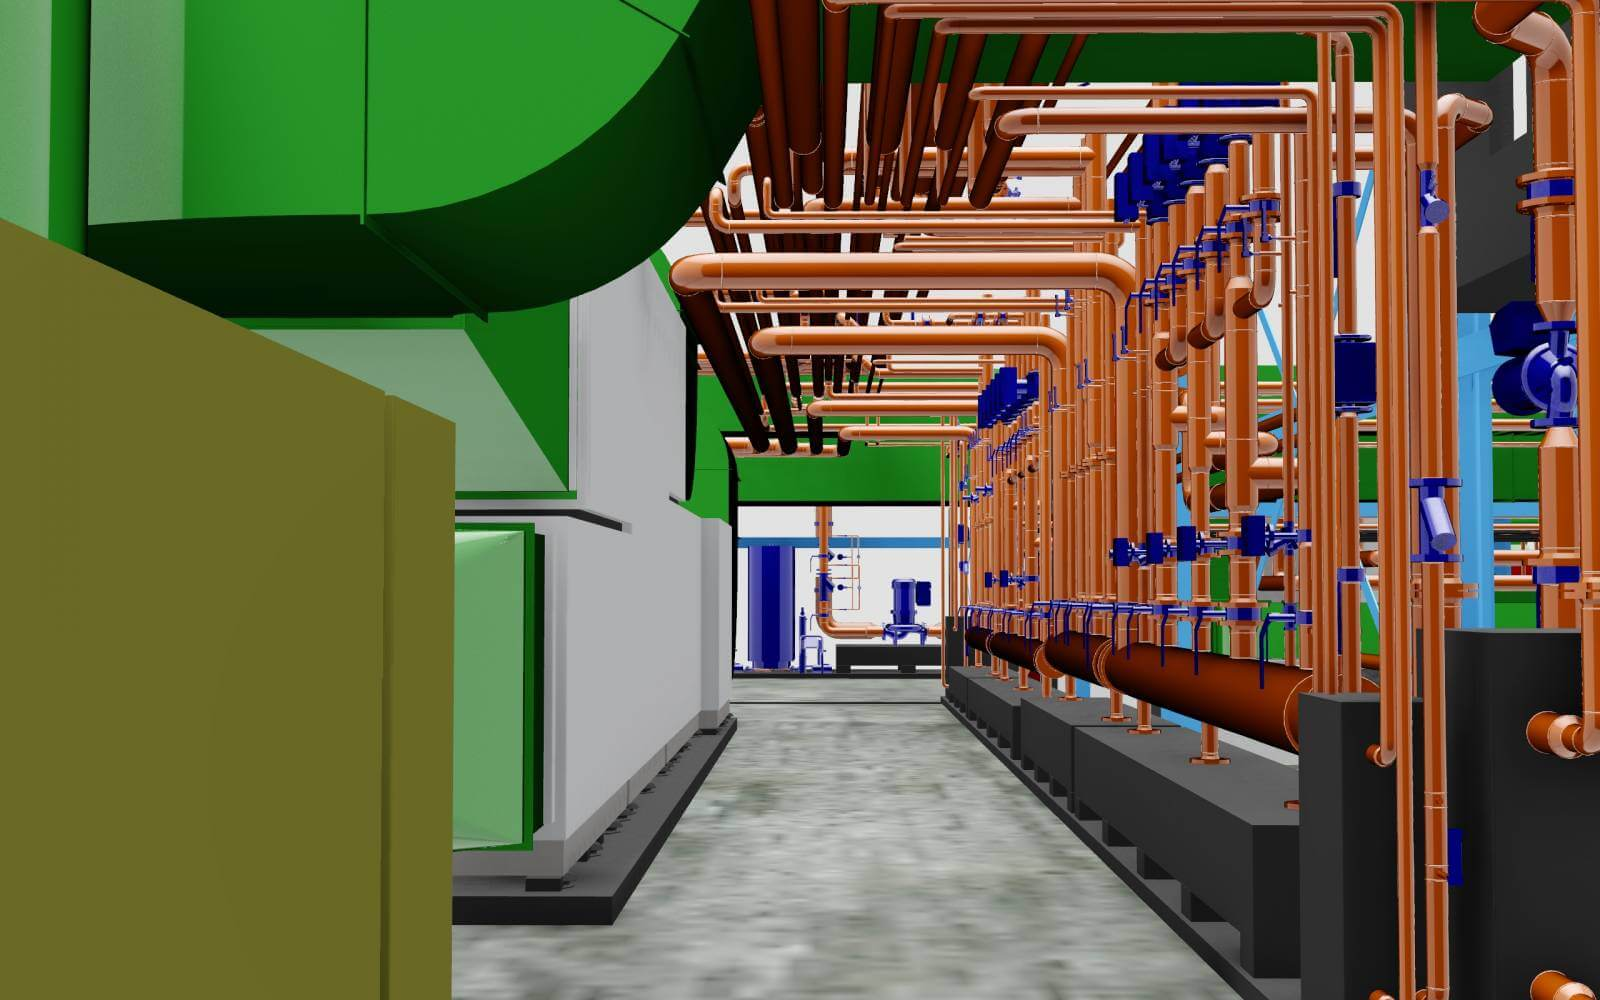 Installatietechniek - TU Delft